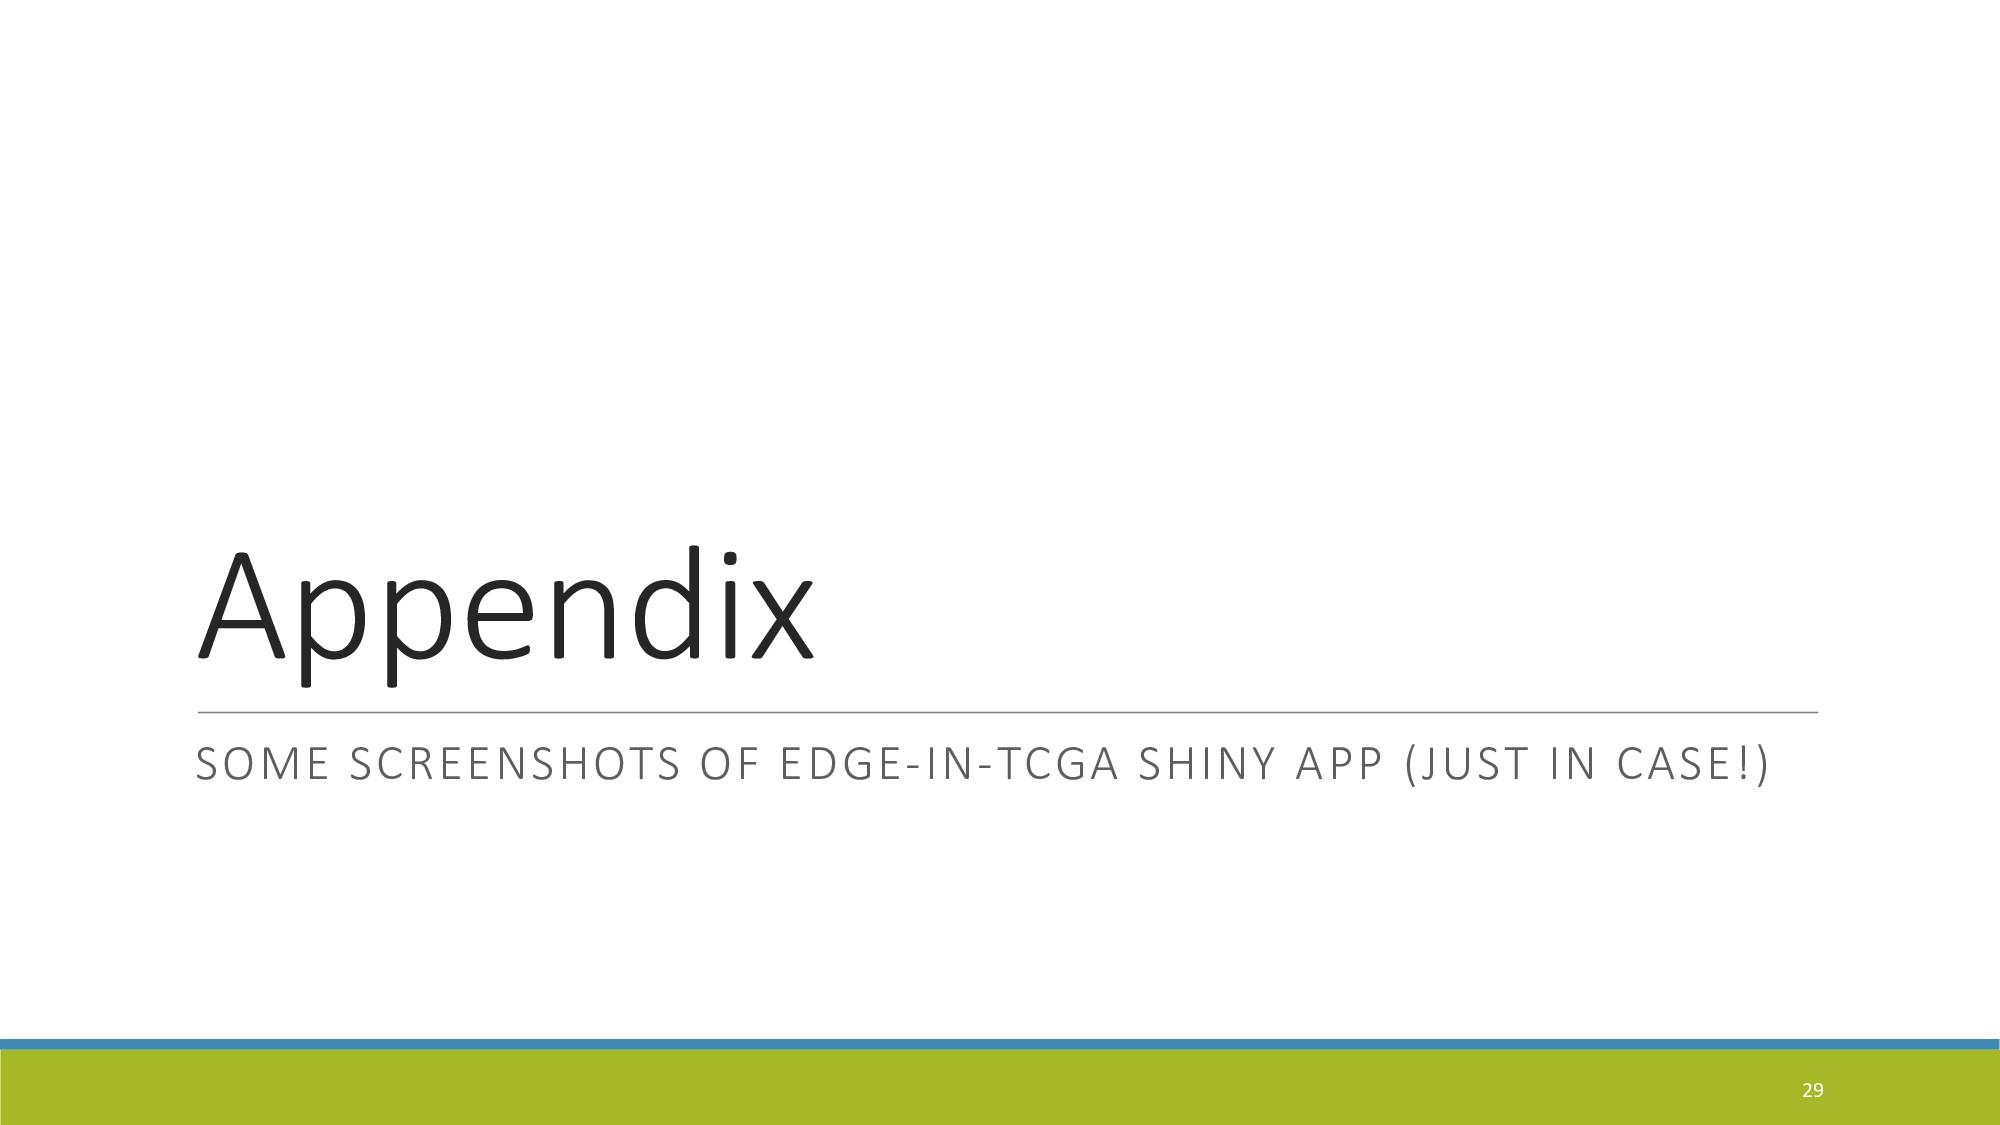 Appendix SOME SCREENSHOTS OF EDGE-IN-TCGA SHINY...